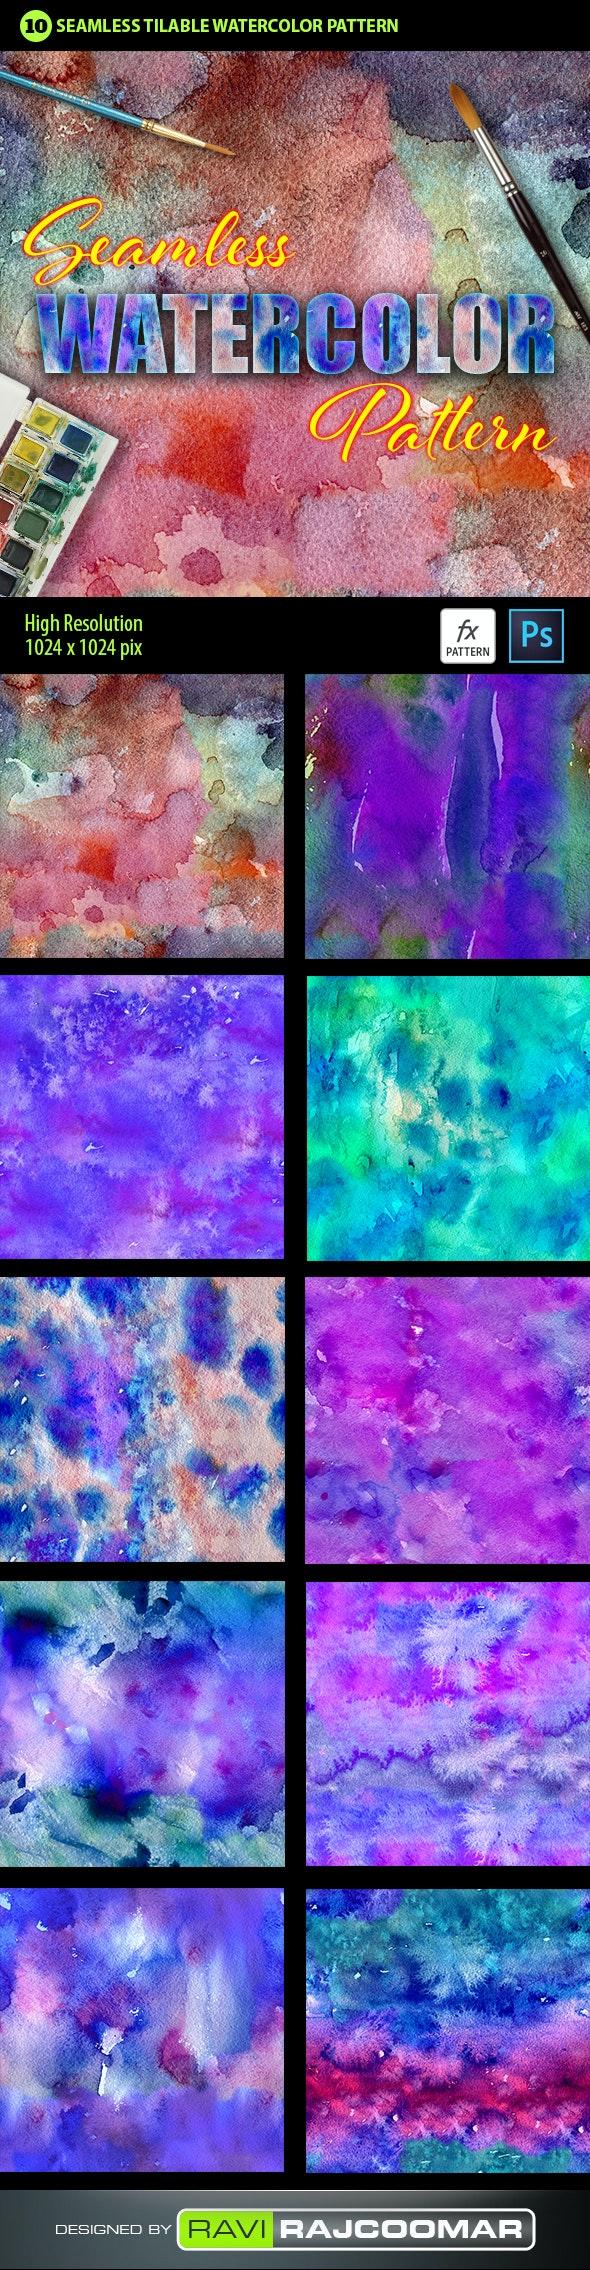 Watercolor Photoshop Pattern Vol.2 - Textures / Fills / Patterns Photoshop